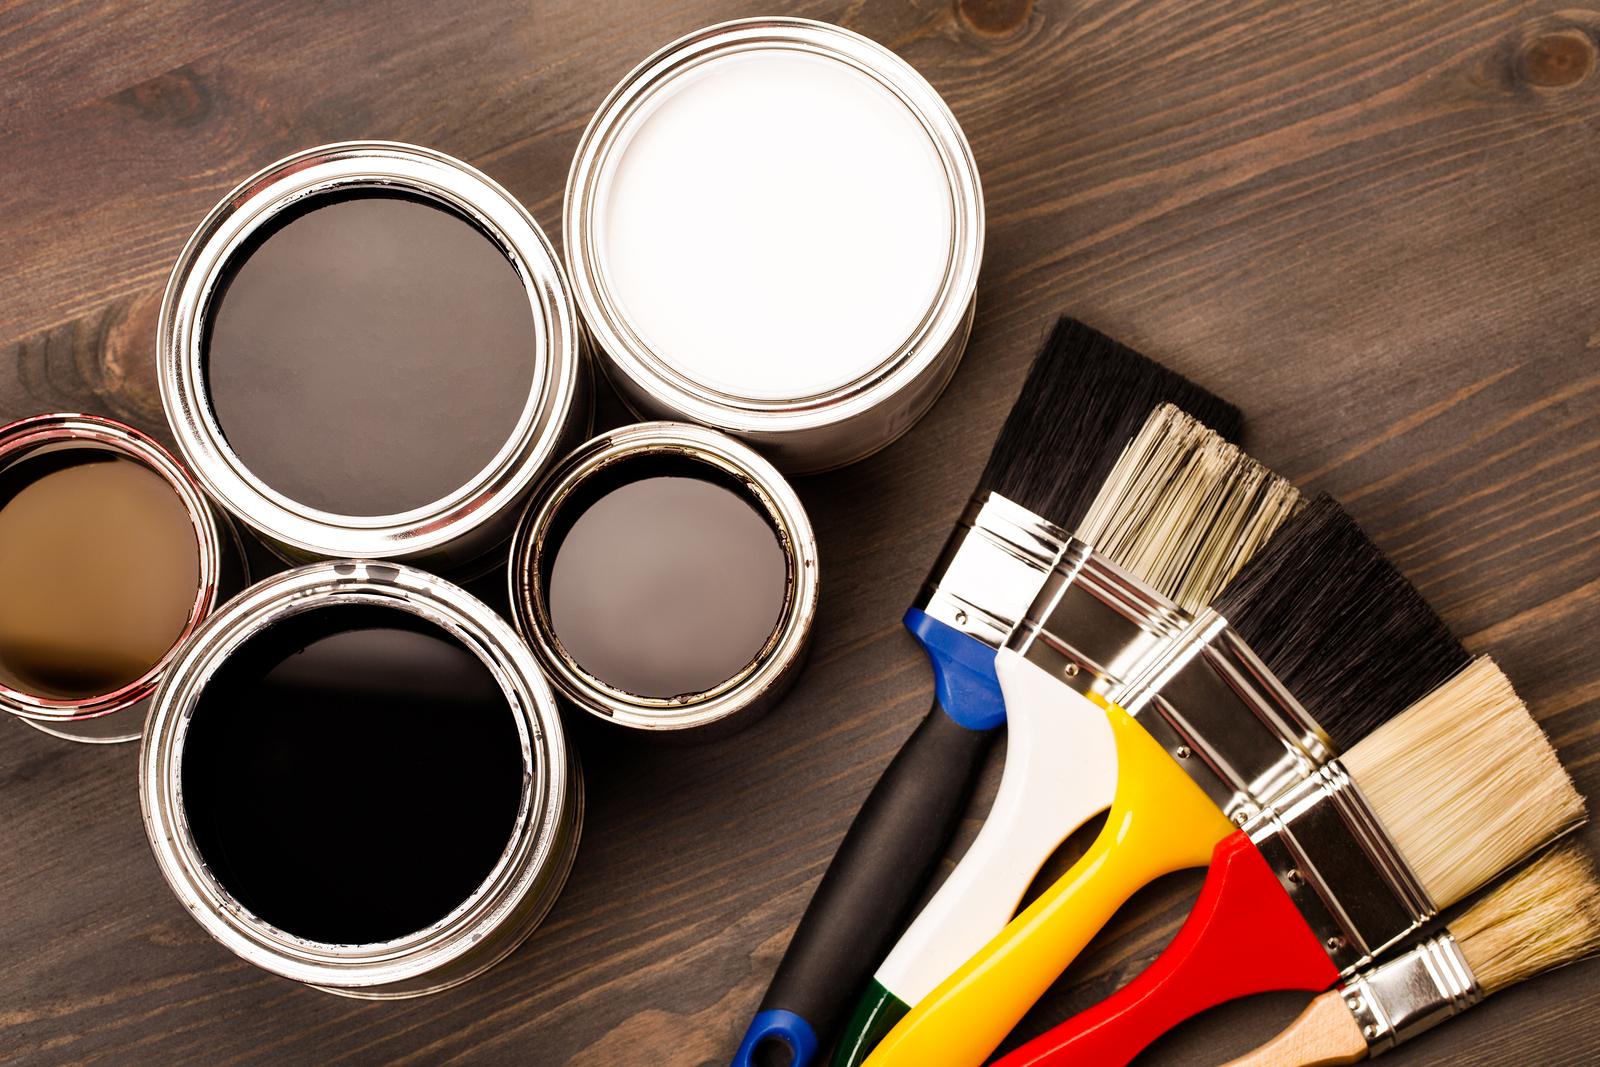 refinishing versus resurfacing hardwood floors